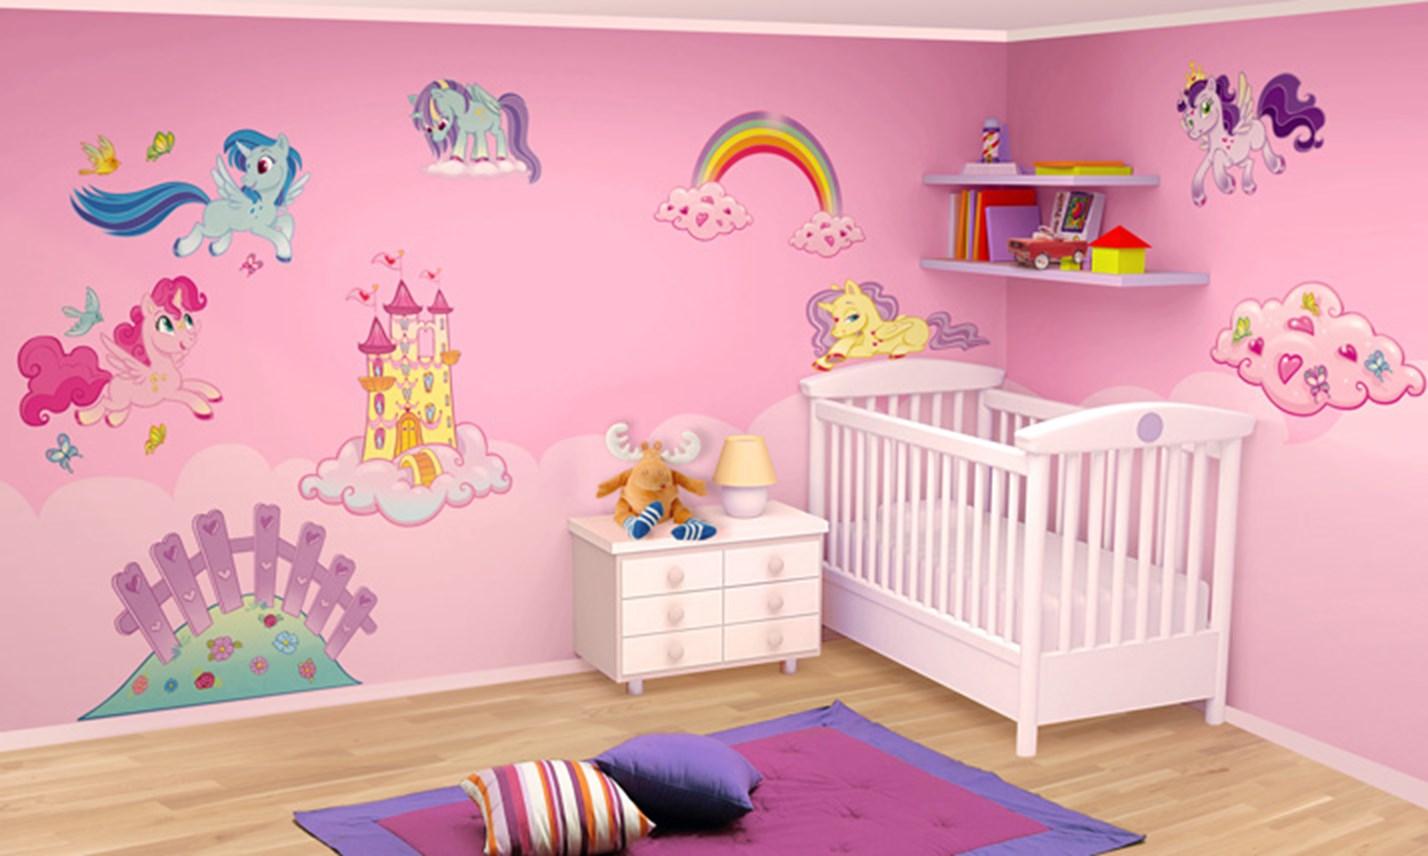 Stickers murali bambini cameretta i mini unicorni leostickers - Adesivi per cameretta bambini ...